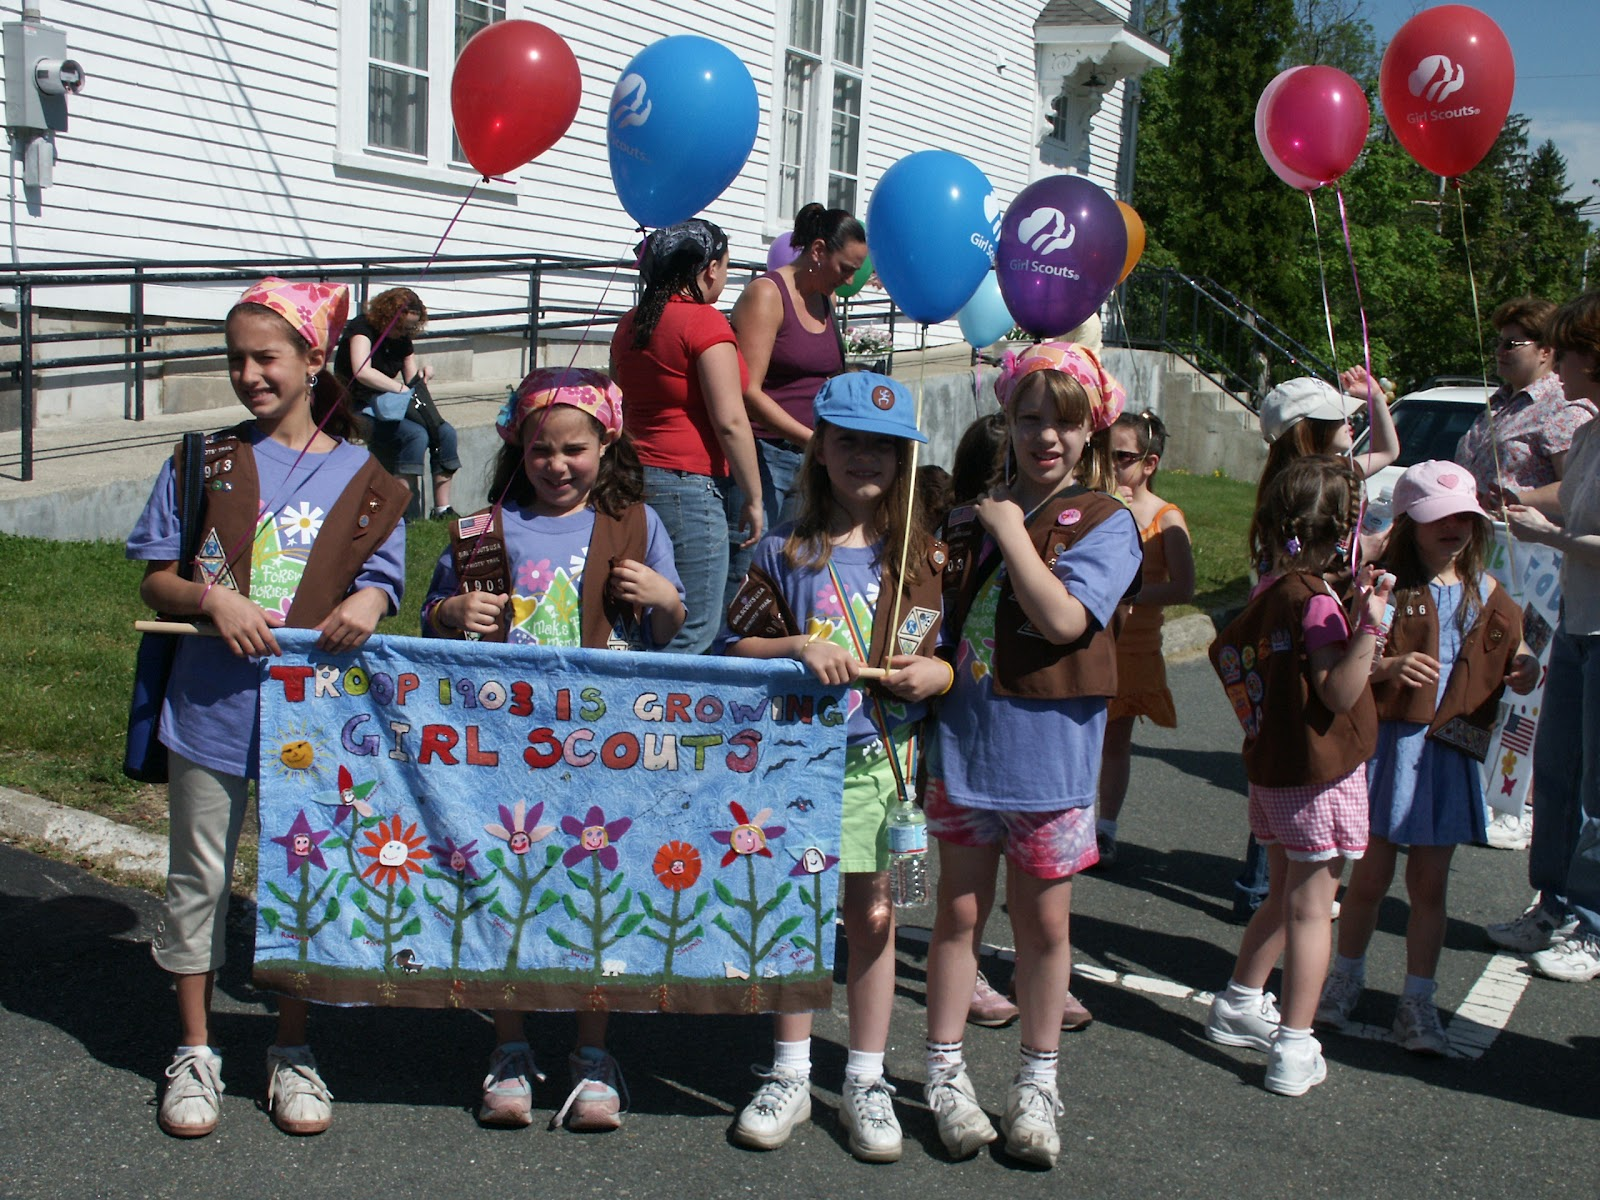 Flower Girl Scout Daisy Banner   Gardening: Flower and